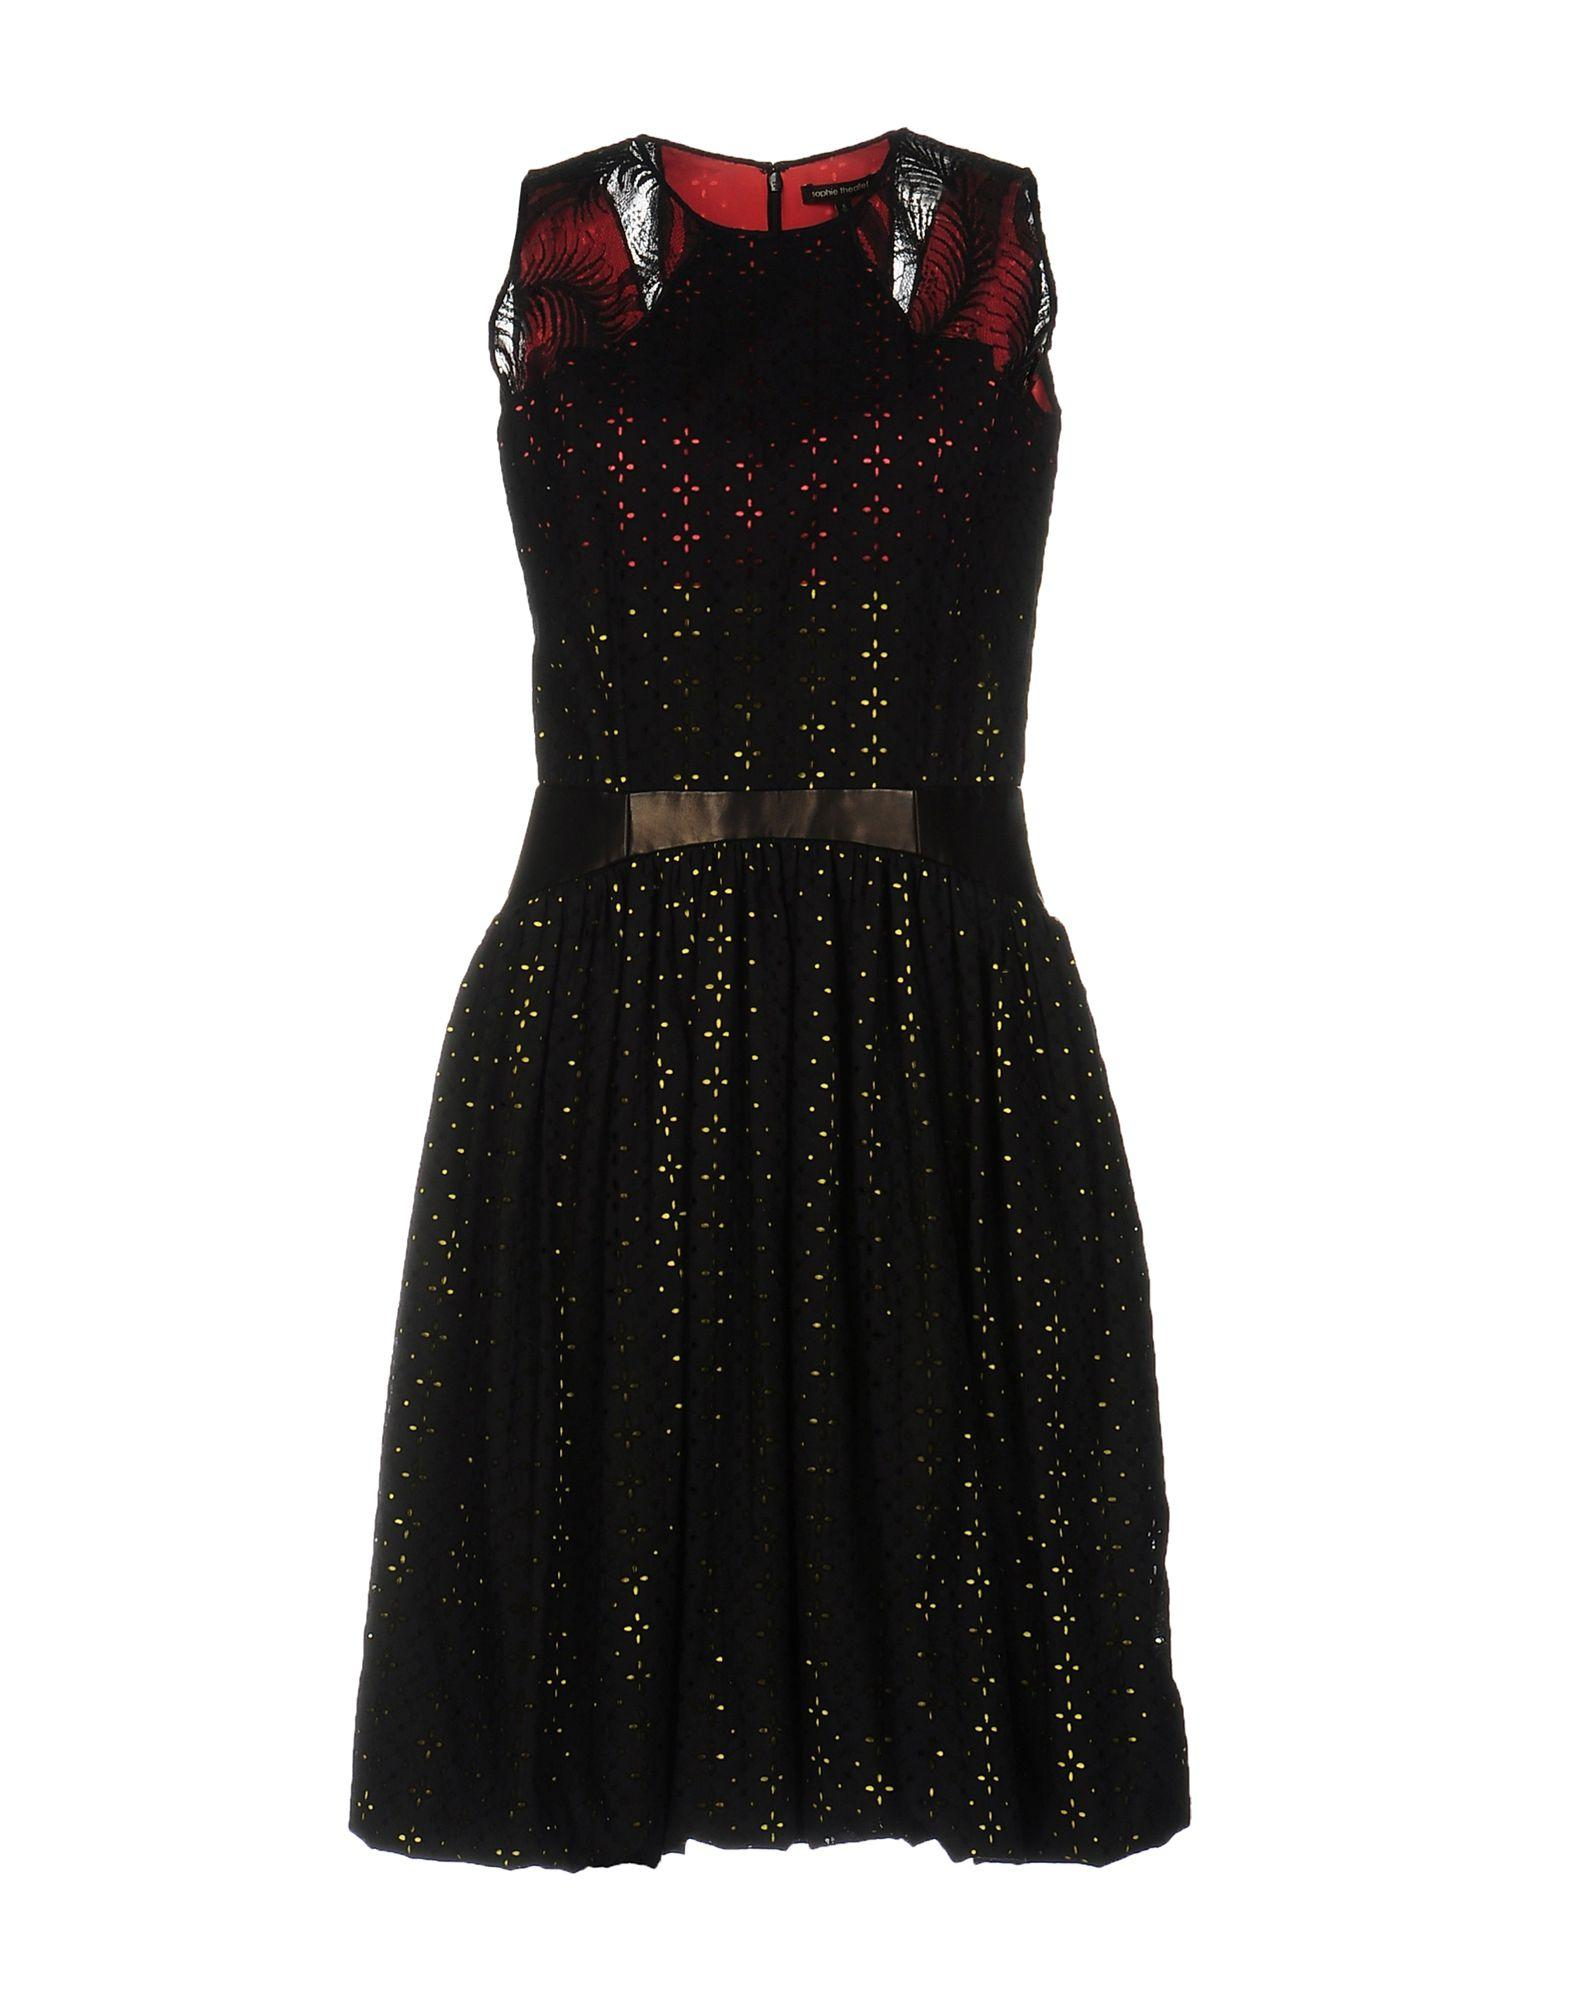 Sophie Theallet Knee-Length Dresses In Black